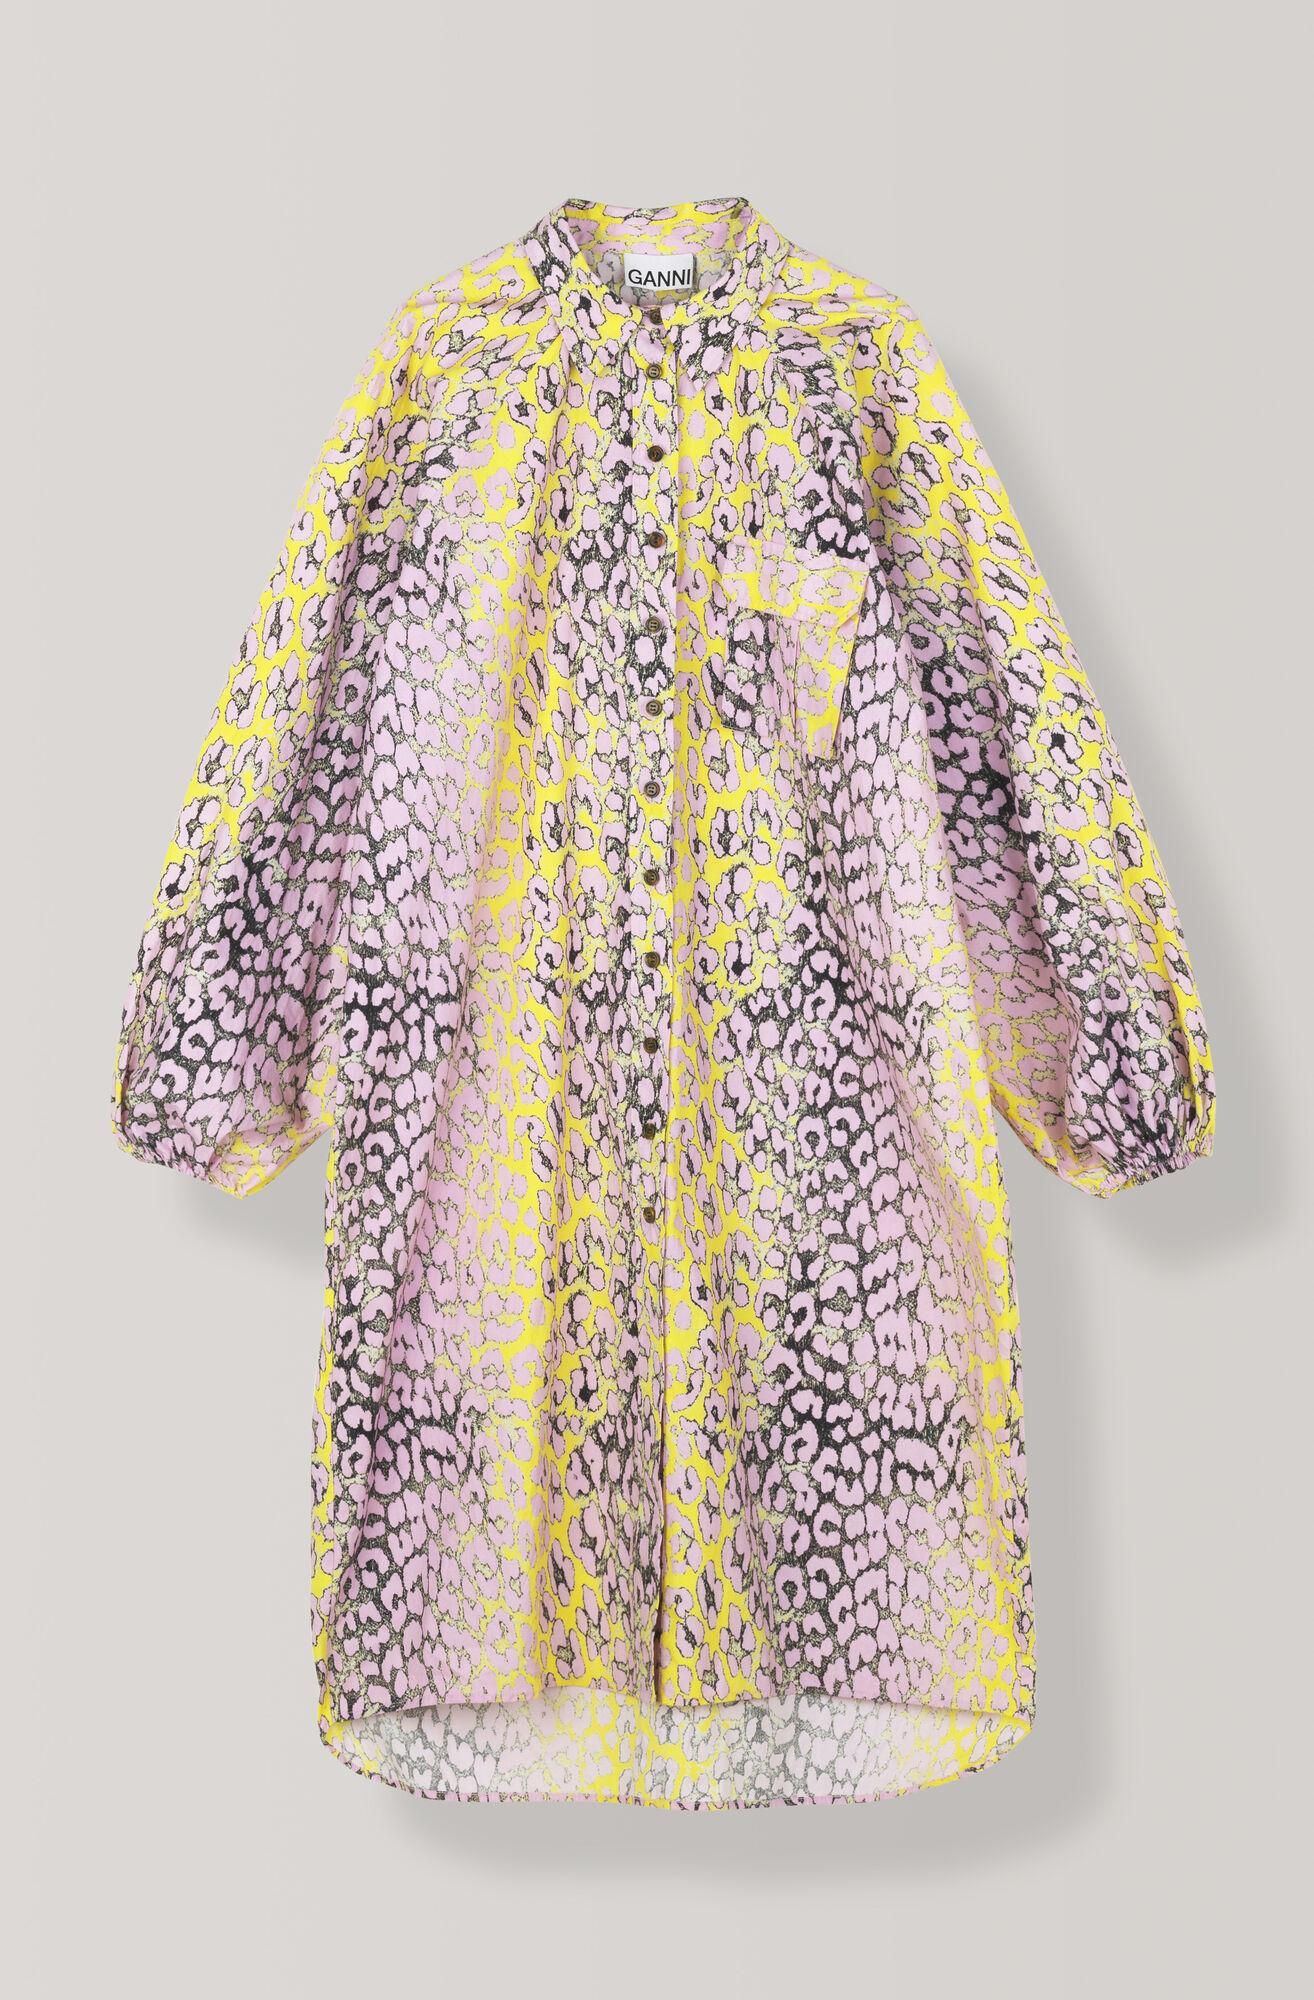 d91c09b90a16 GANNI Printed Cotton Poplin Shirt Dress ( 200.00 GBP ) | Shop your ...